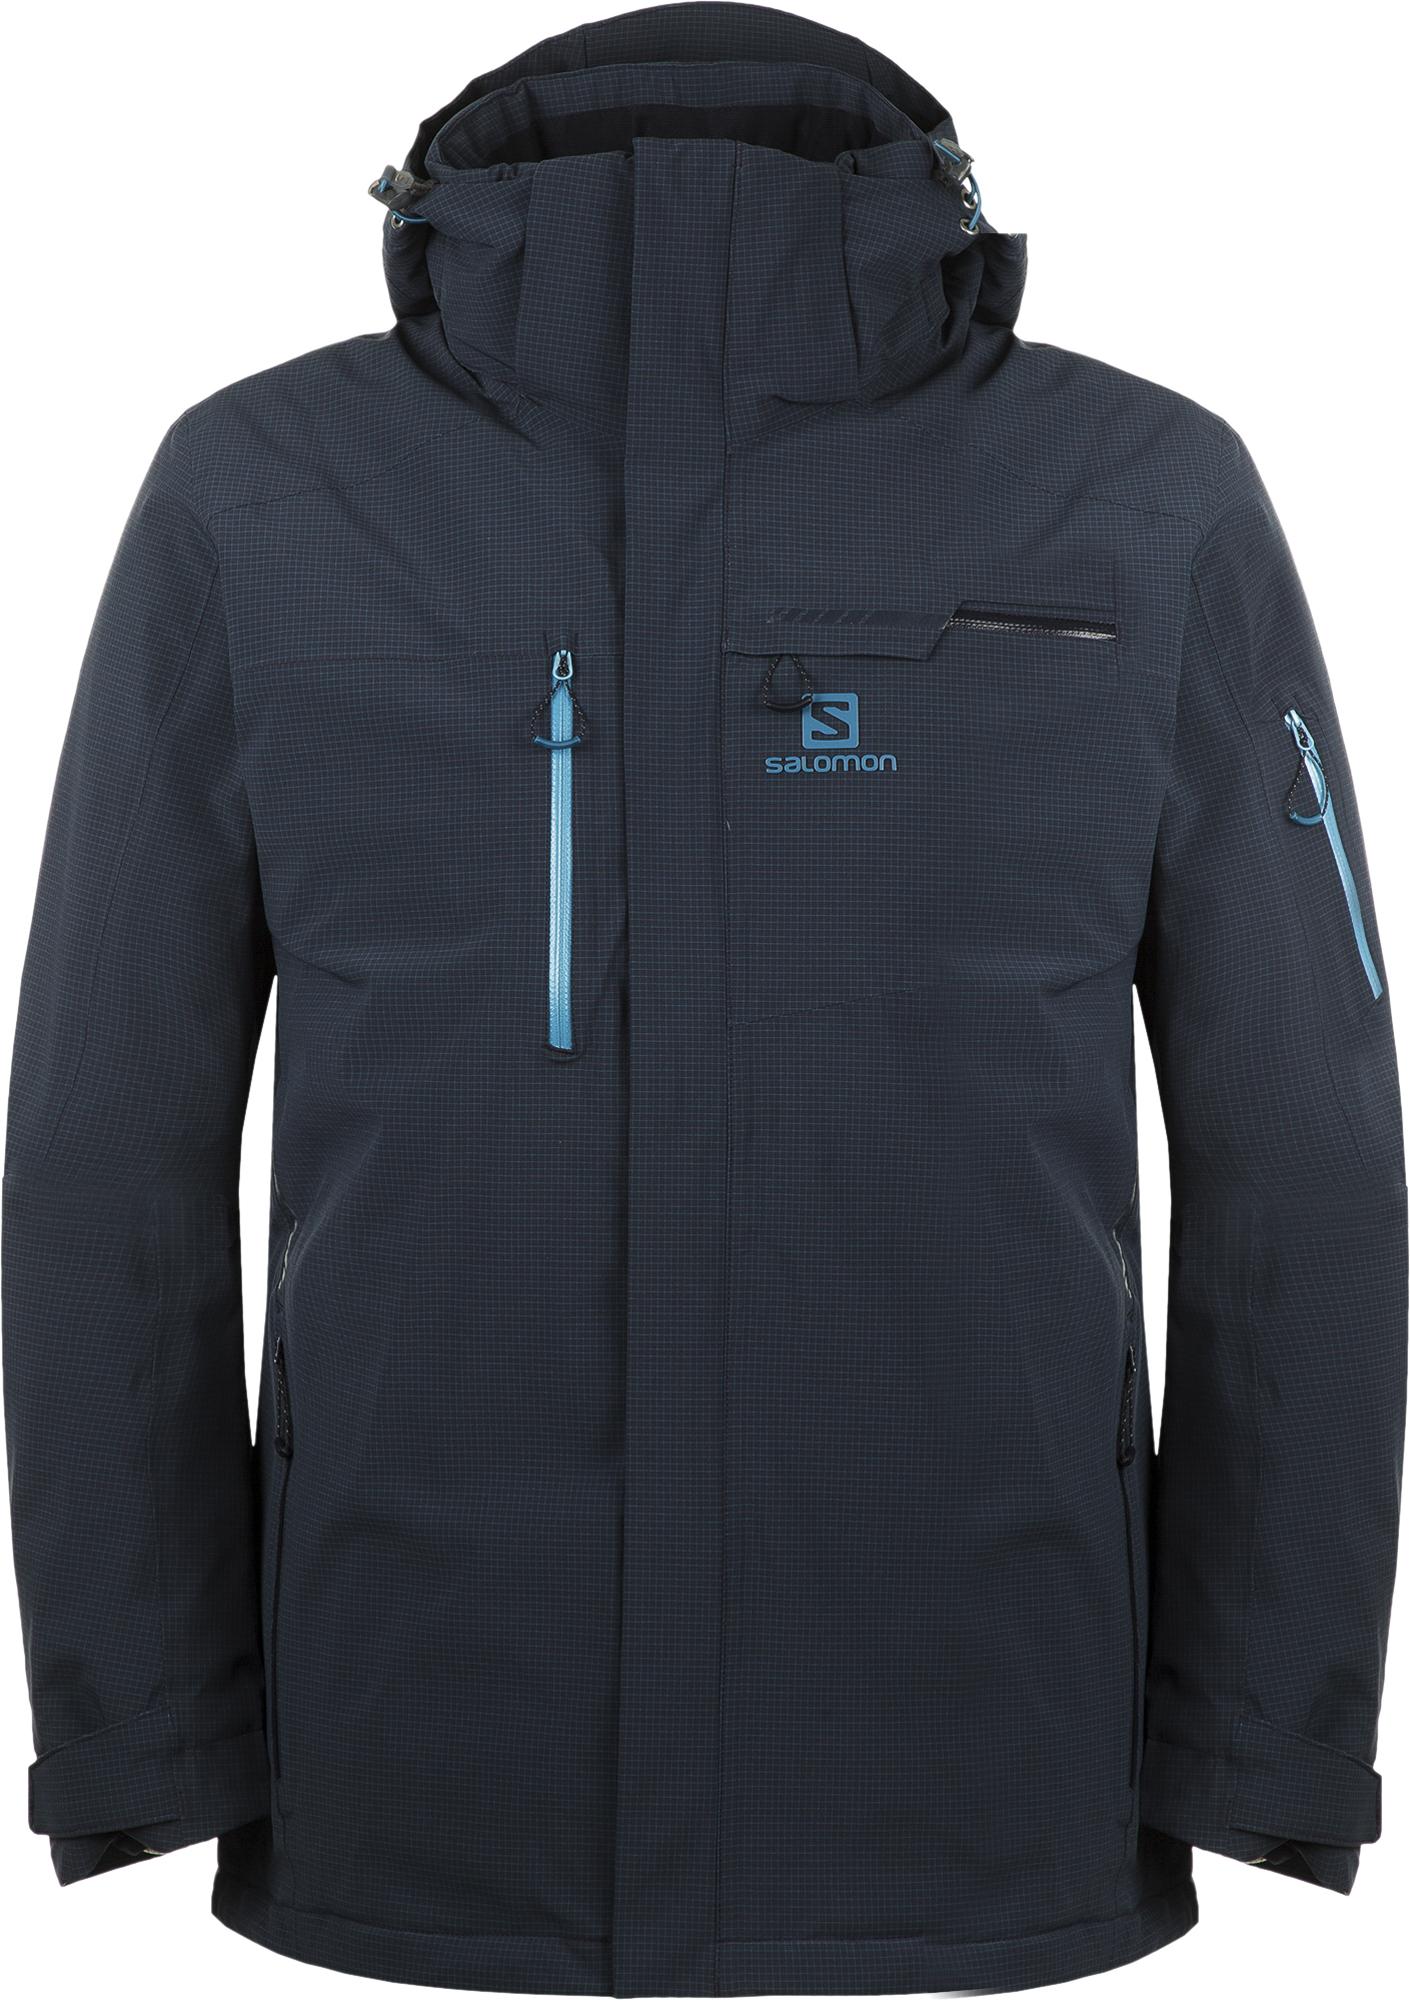 цена Salomon Куртка утепленная мужская Salomon Brilliant, размер 50-52 онлайн в 2017 году